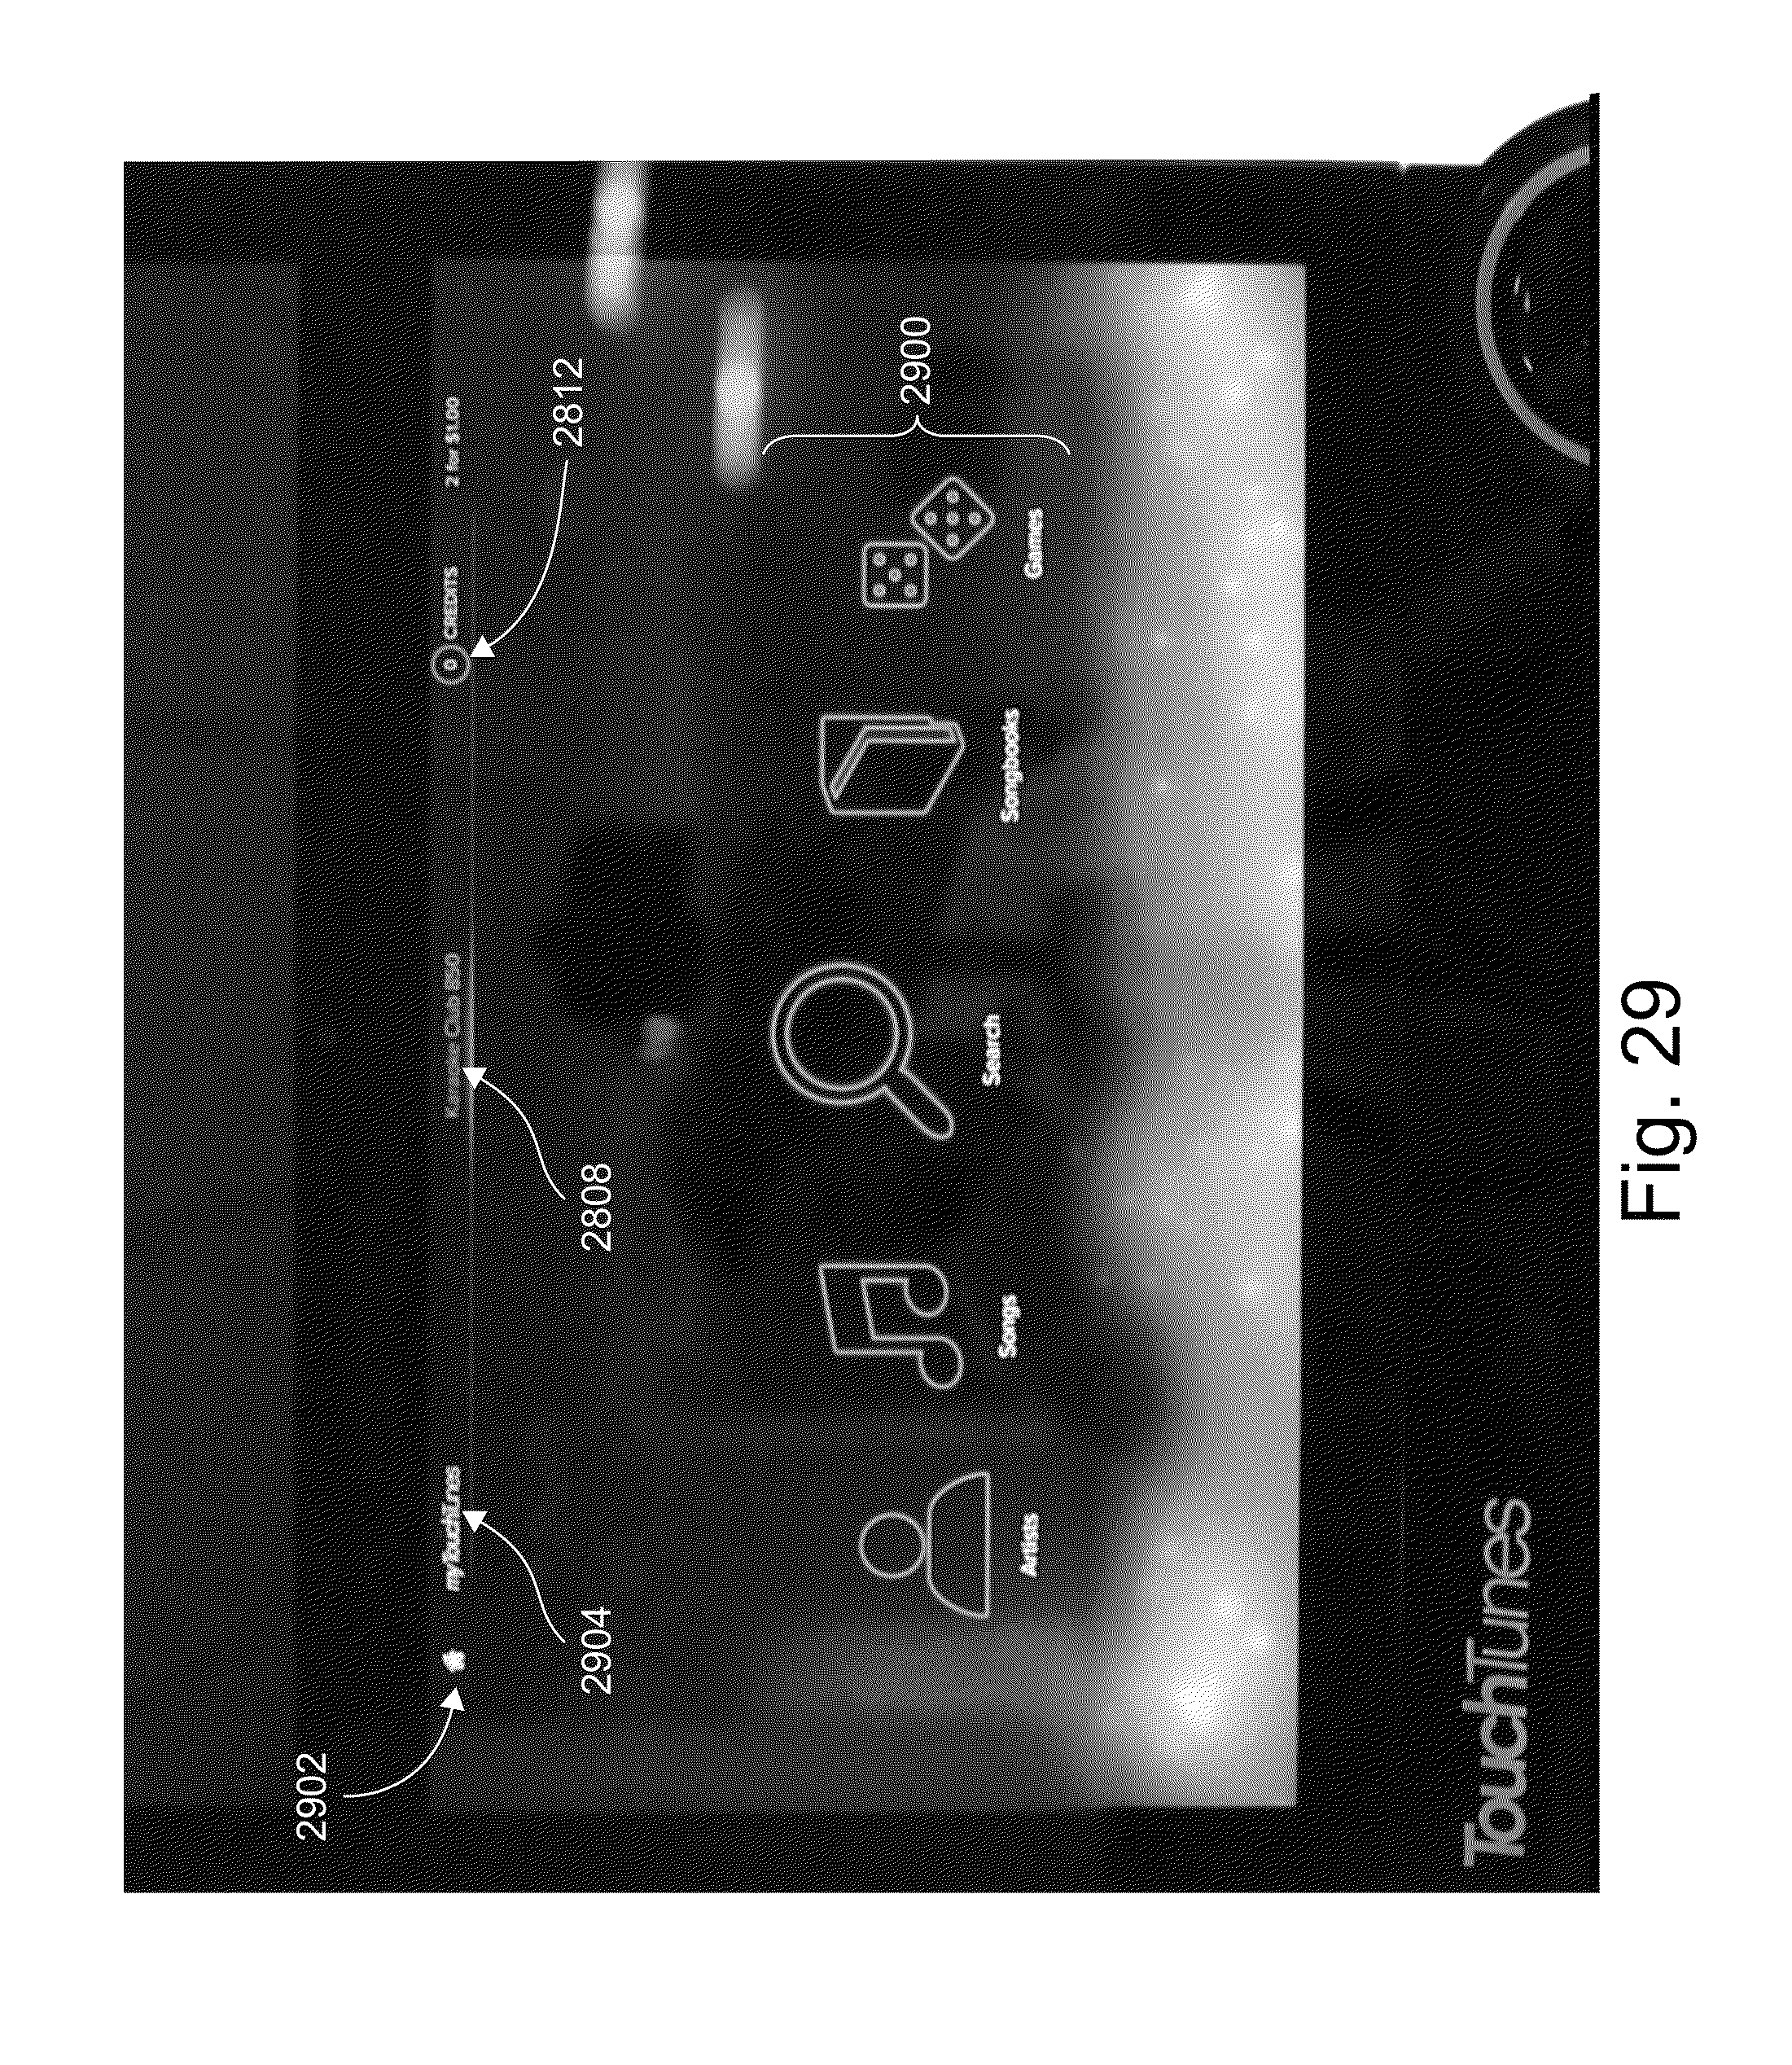 Patent US 9,292,166 B2